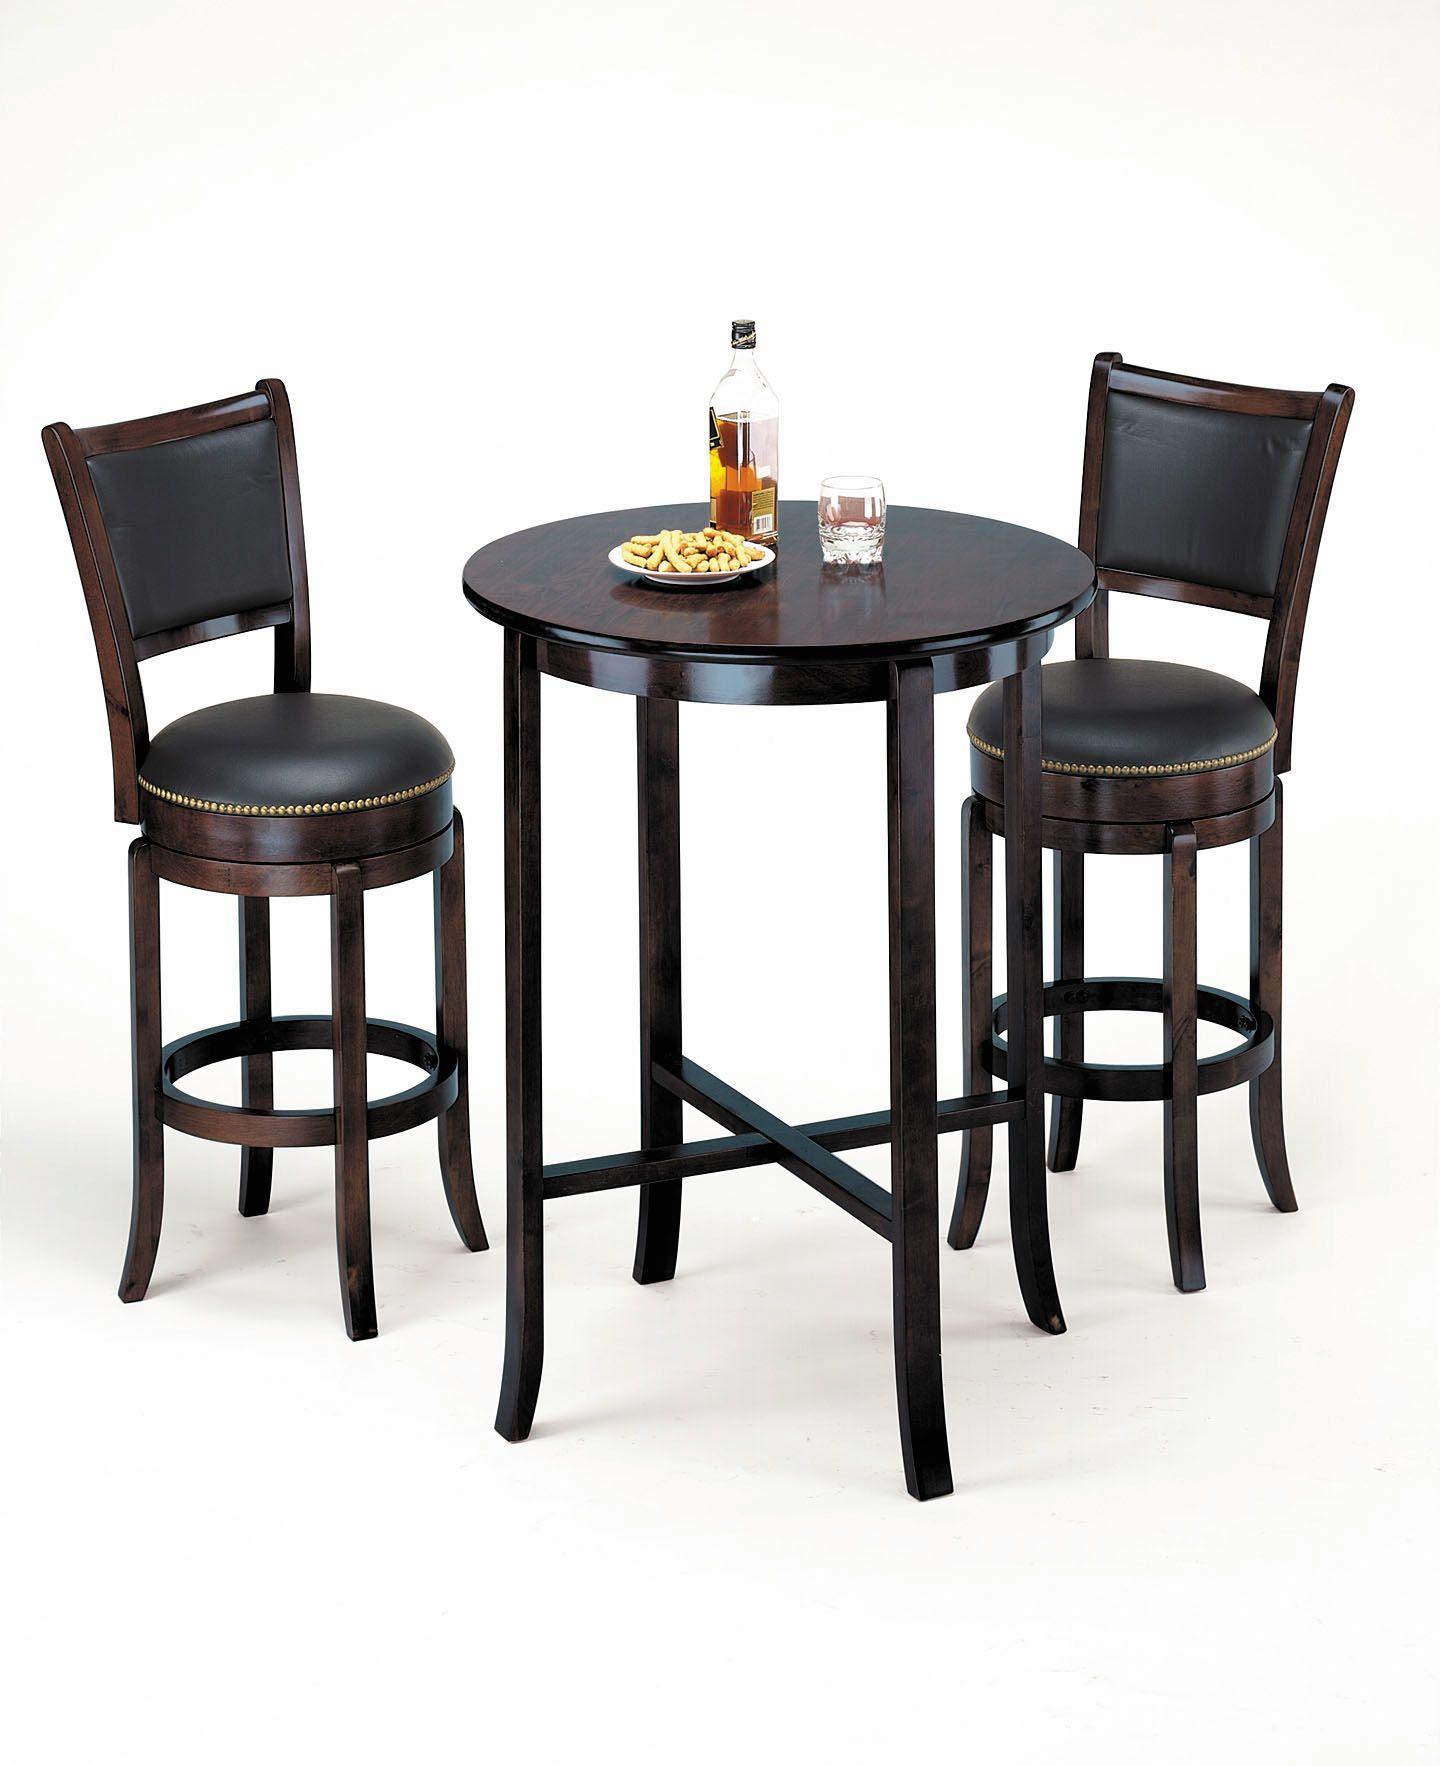 Acme High Back Swivel Bar Chair